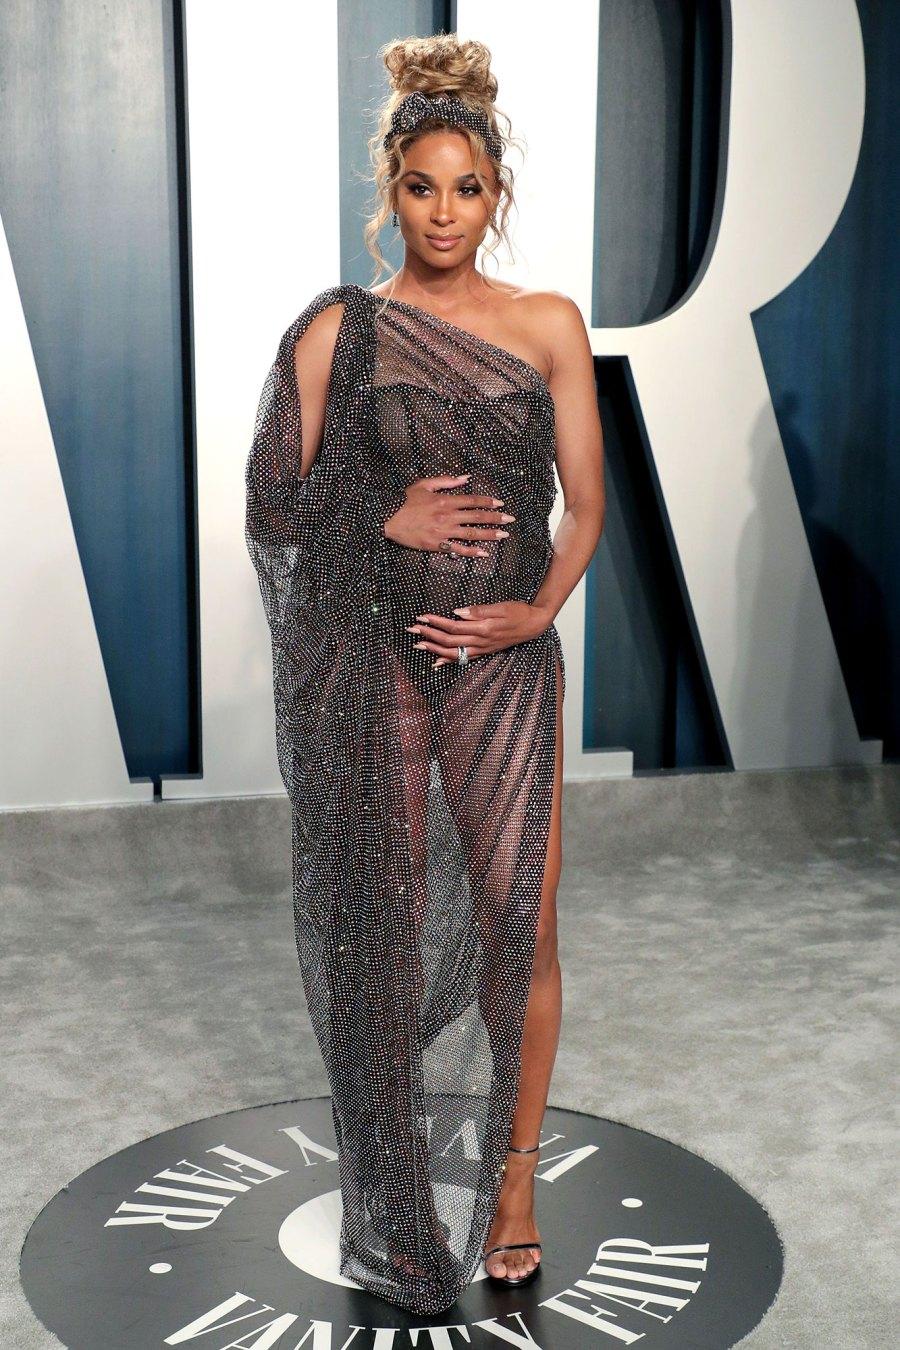 Ciara Vanity Fair Oscar Party Wearing Ralph and Russo Sheer Dress Oscars 2020 Oscars Baby Bumps